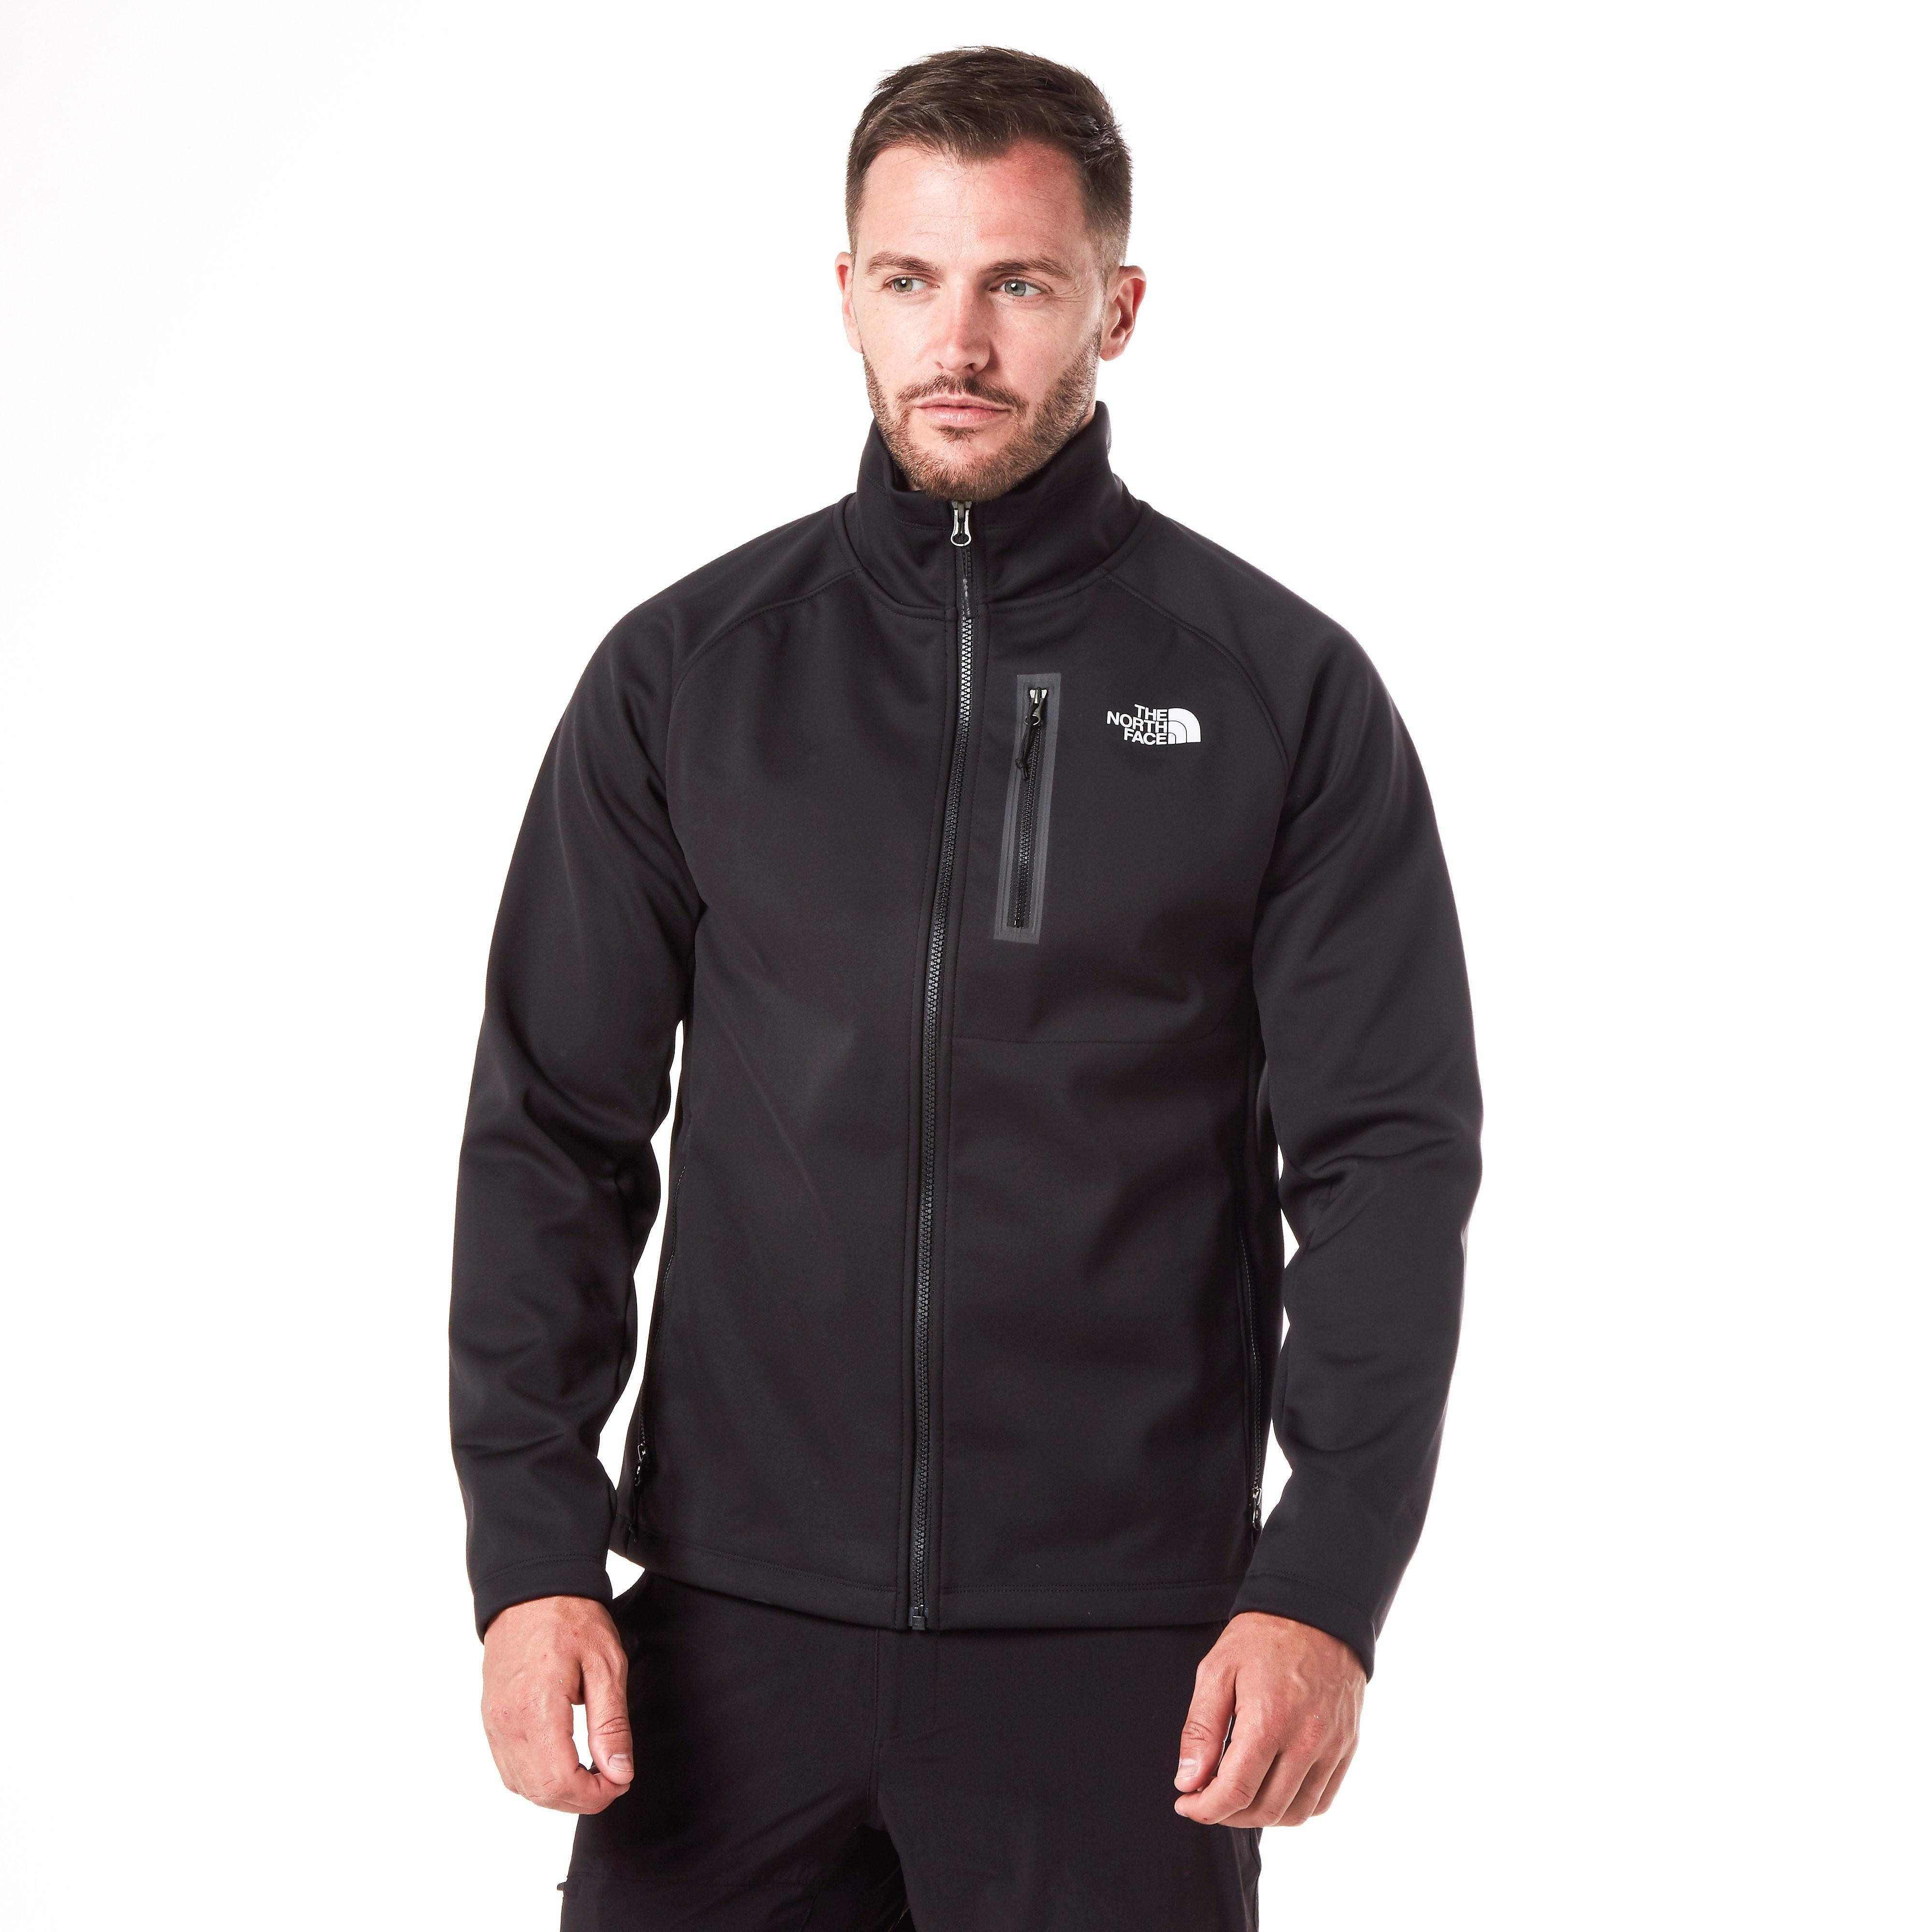 The North Face Men's Canyonlands Softshell Jacket